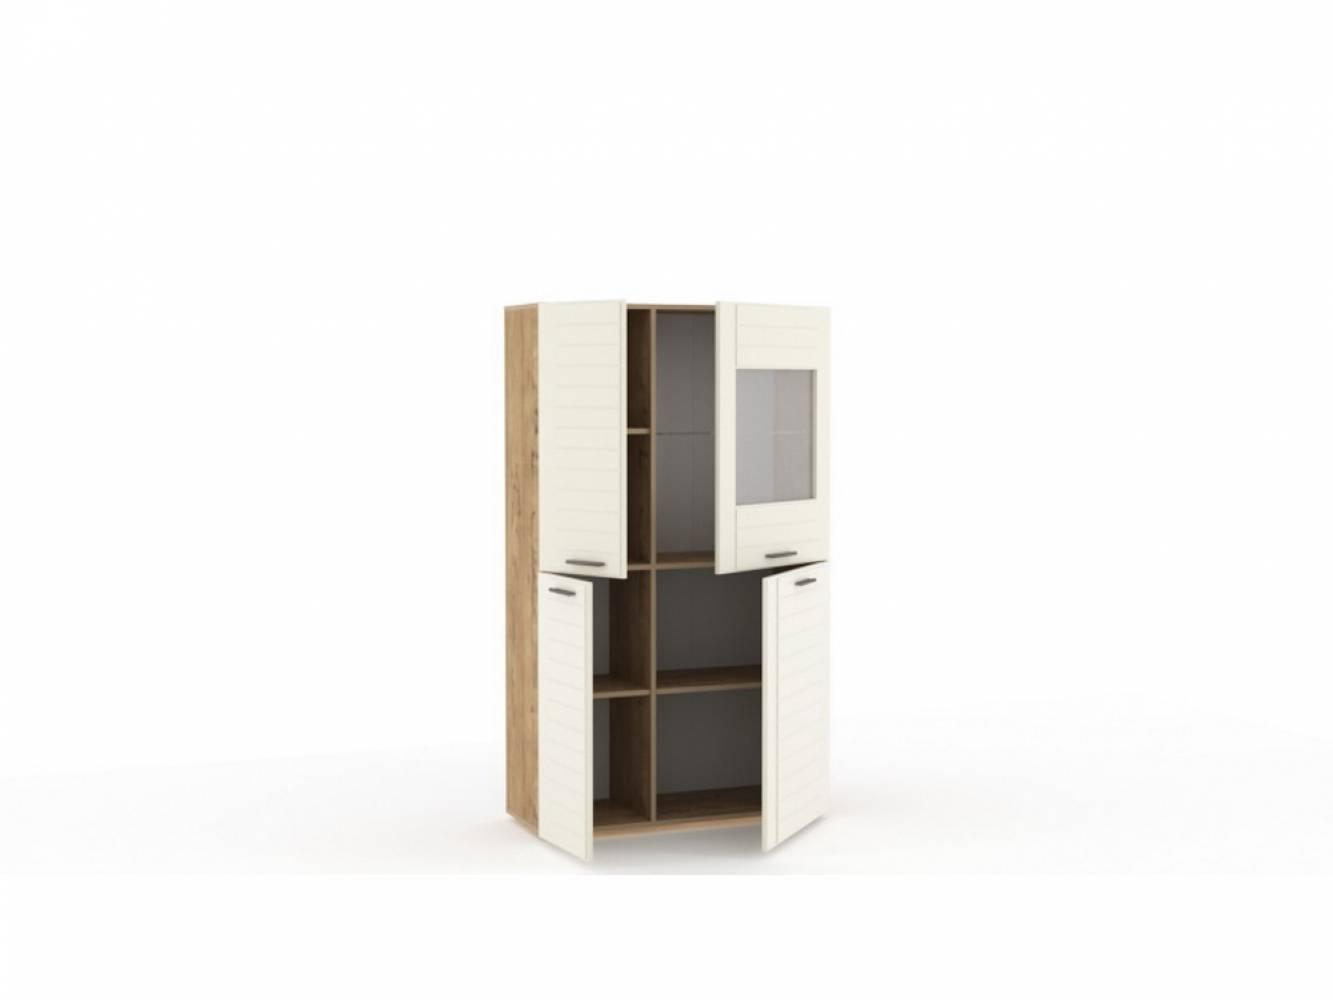 Шкаф комбинированный НМ 011.48-01 LIVORNO (Дуб Бунратти/Софт Панакота)